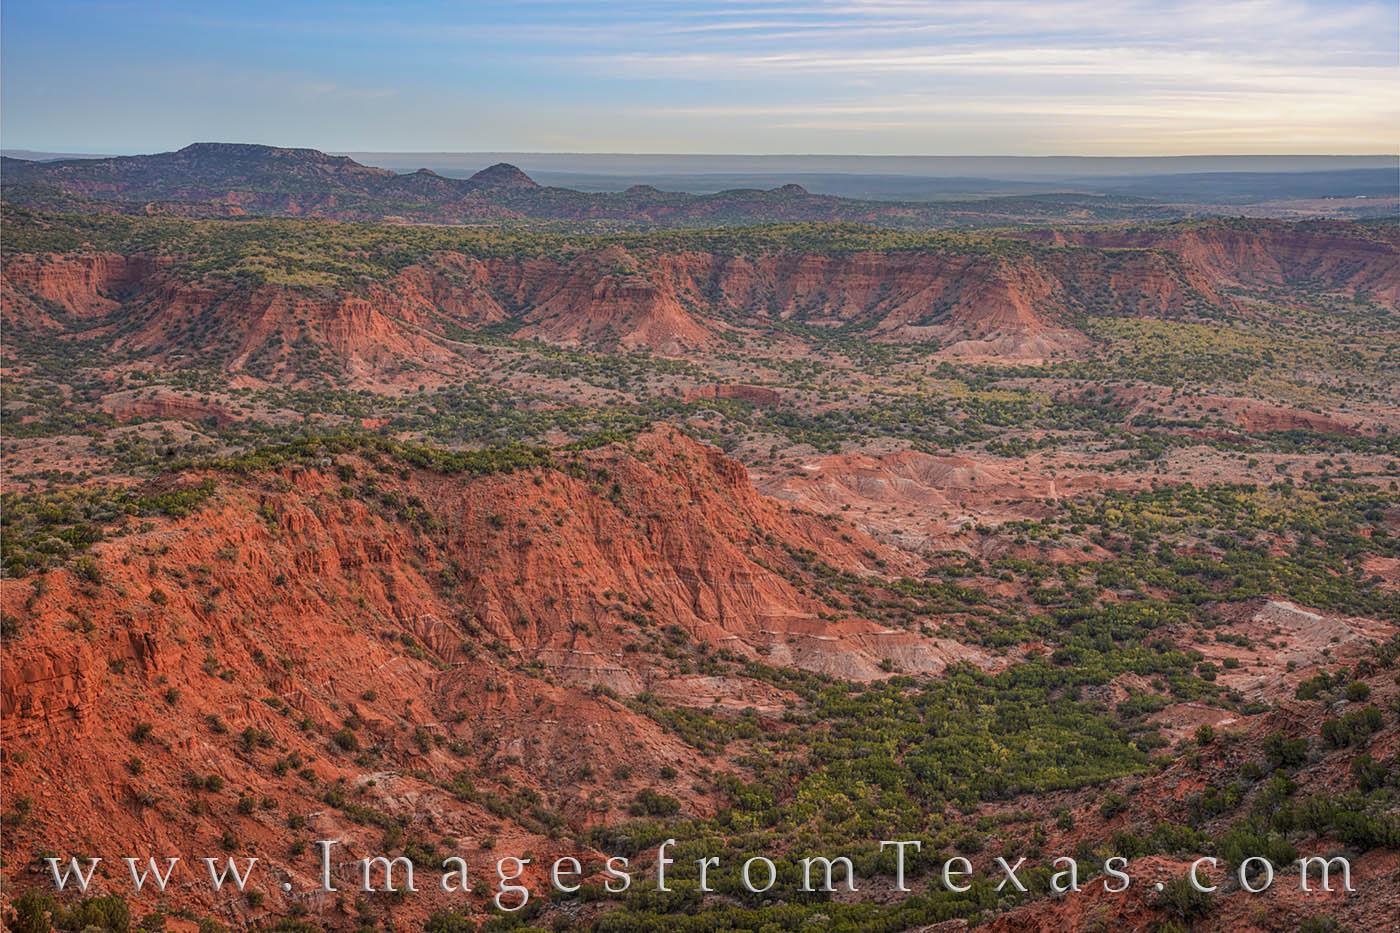 caprock canyon prints, caprock canyons state park, haynes ridge overlook, morning, sunrise, orange, state parks, texas landscapes, west texas, hiking, exploring, photo